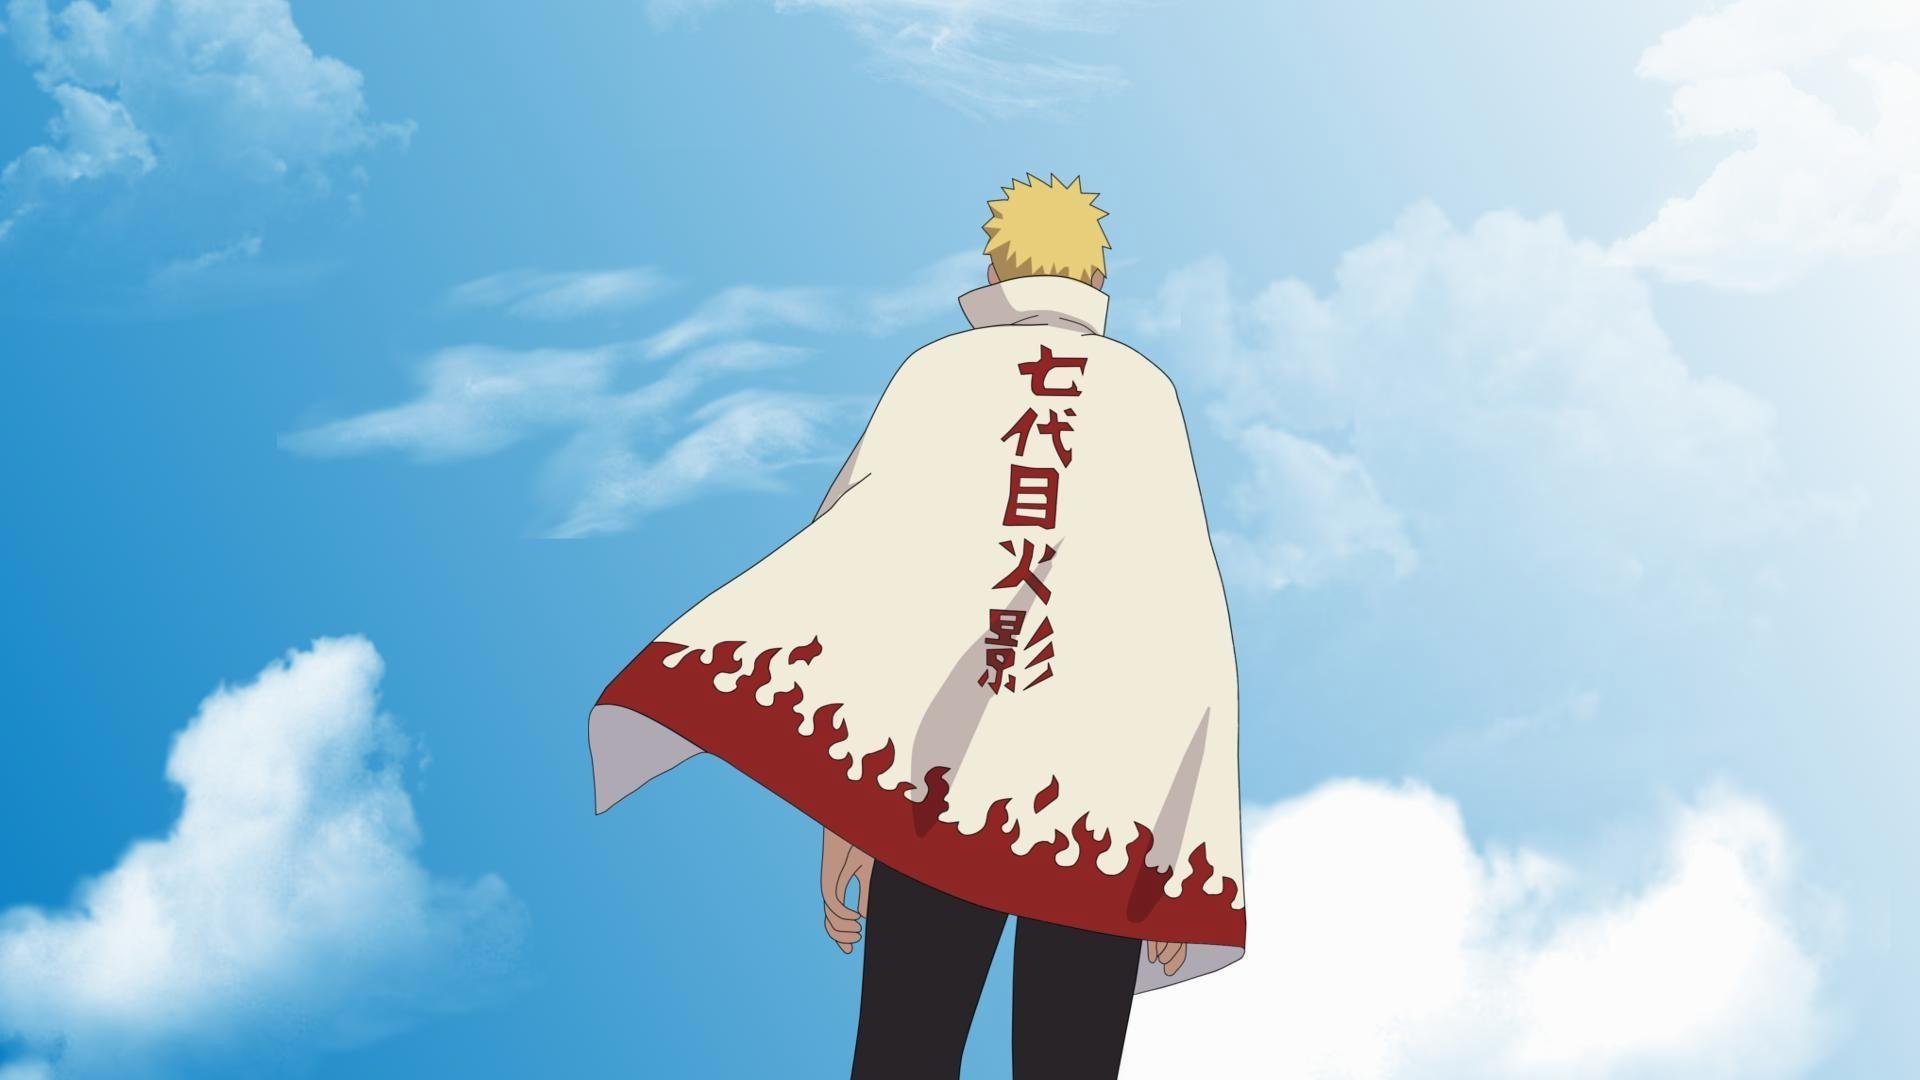 Naruto-.-1920×1080-Need-iPhone-S-Plus-Background-